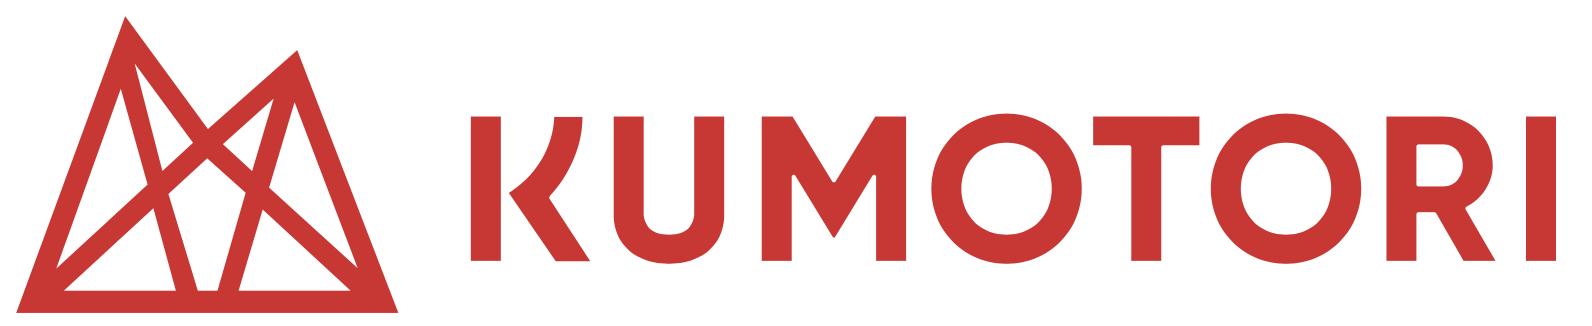 株式会社KUMOTORI(KUMOTORI Inc.)